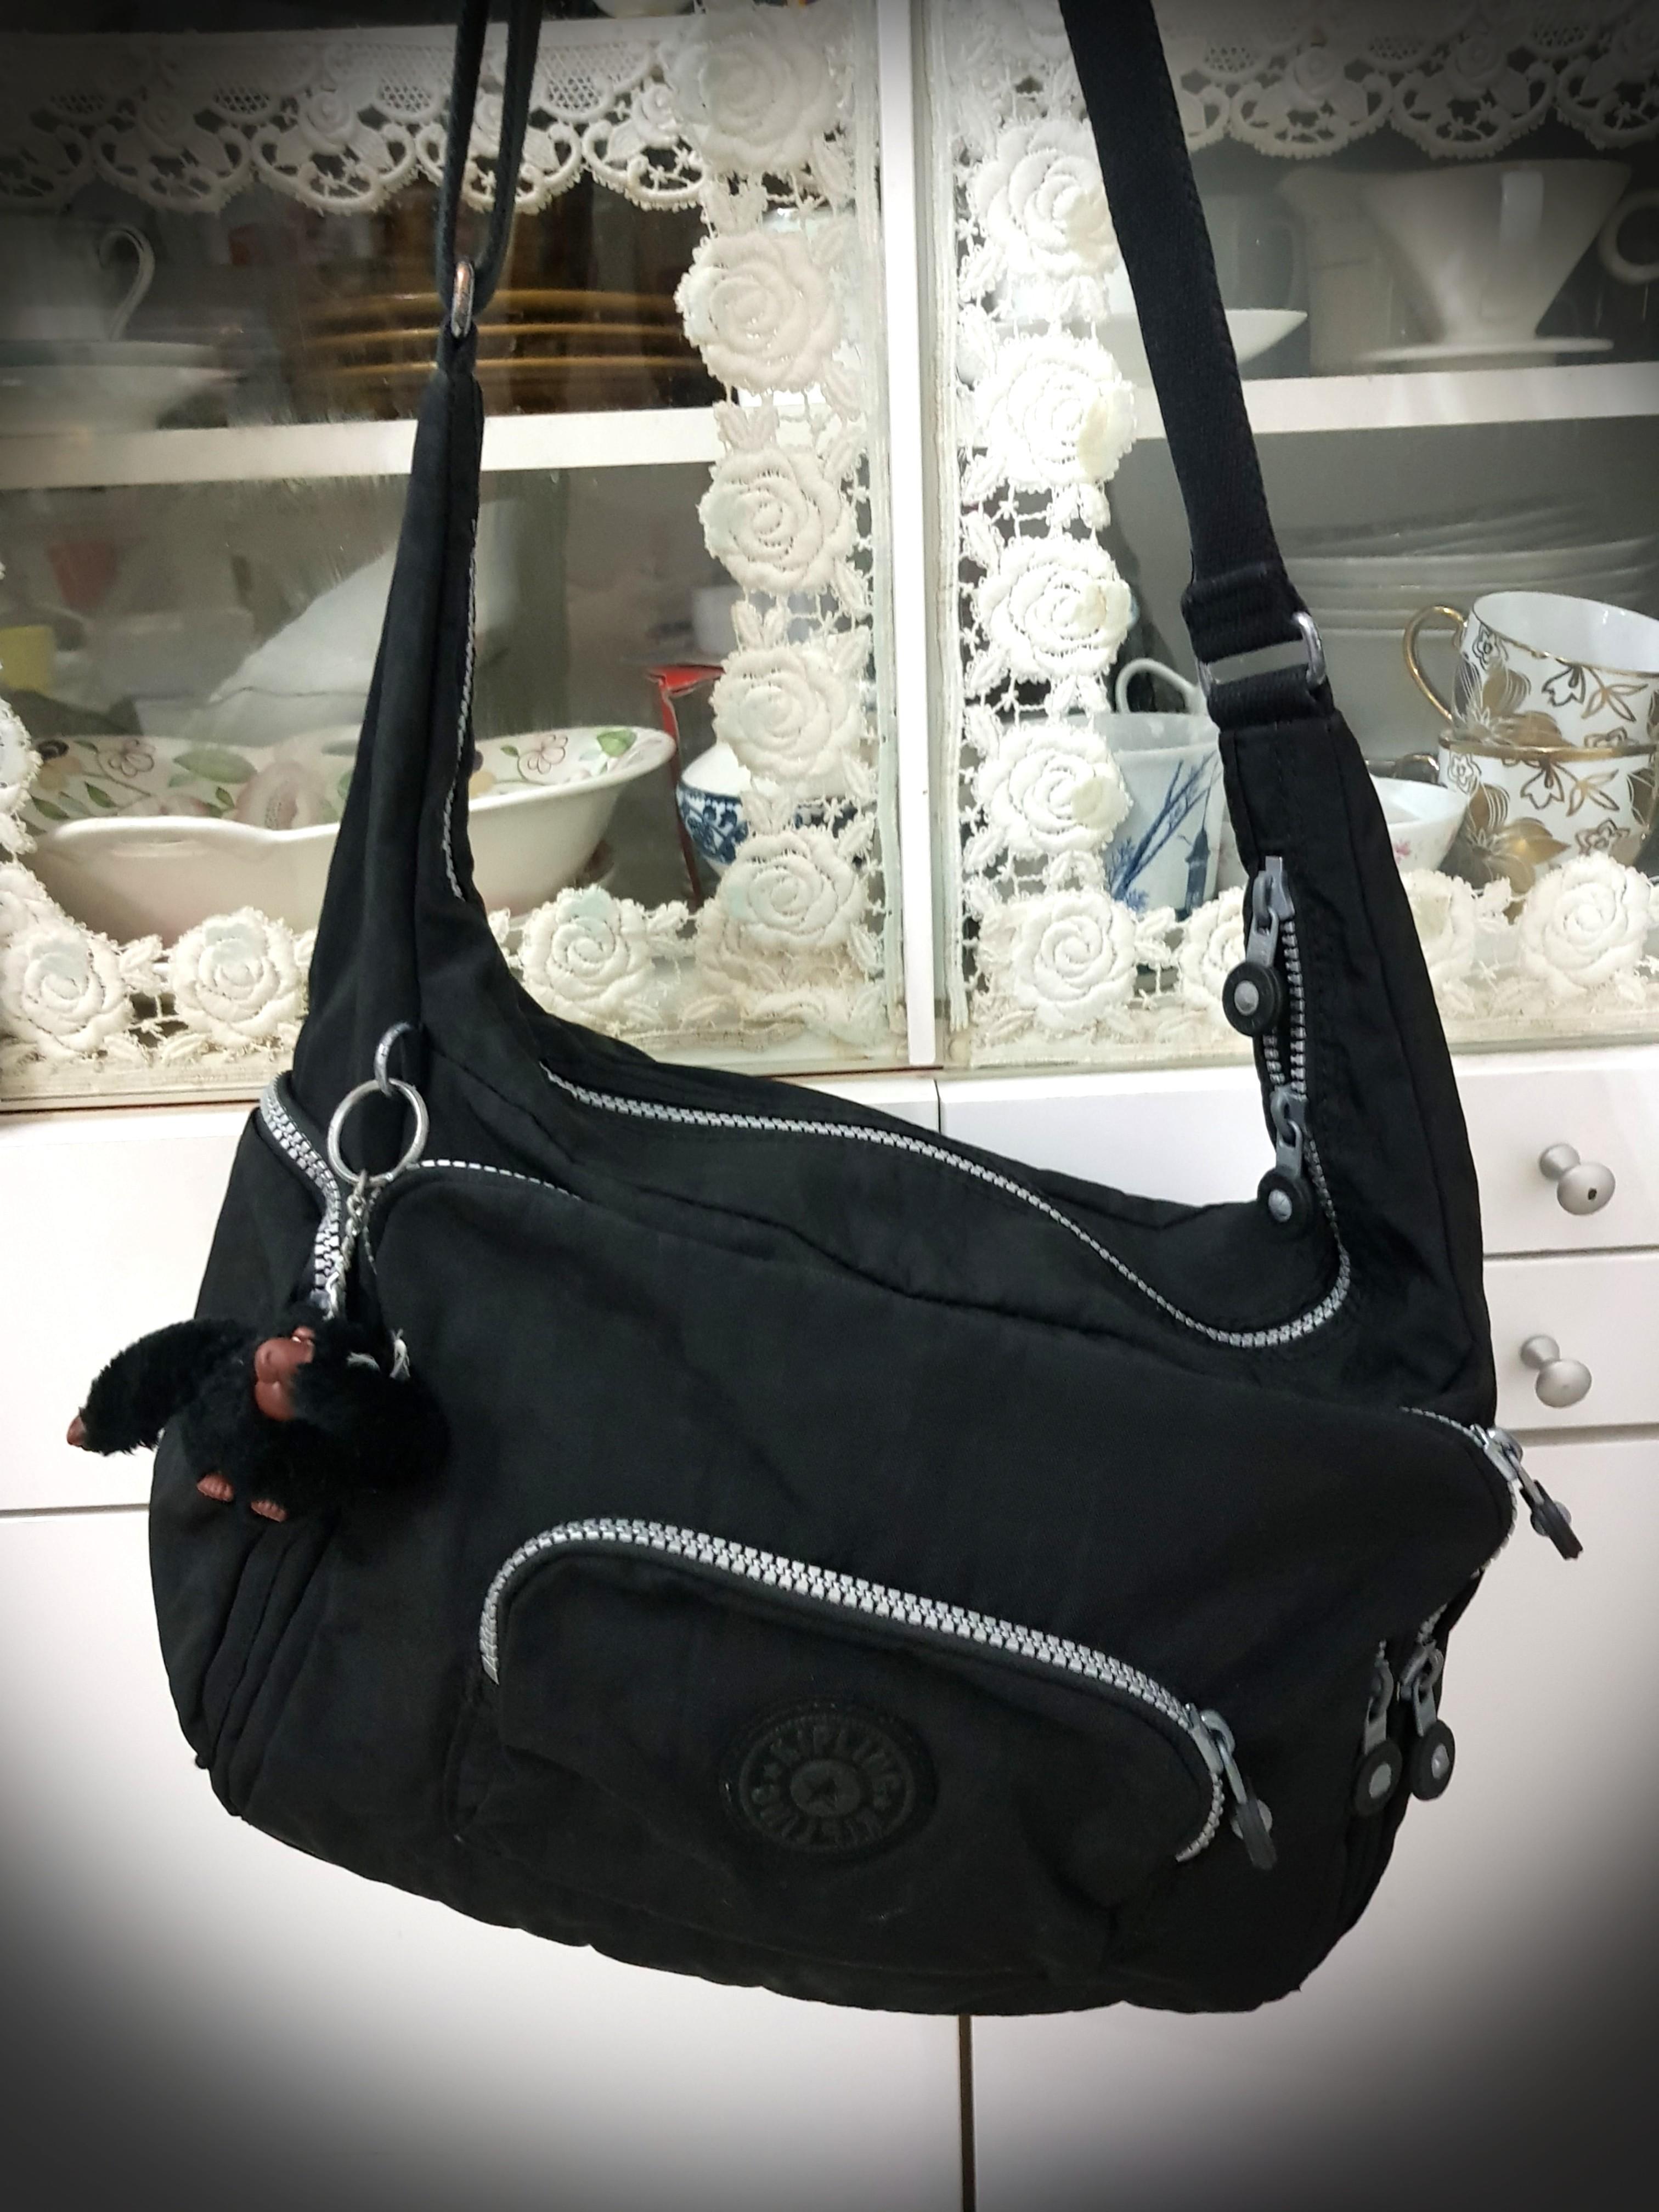 Fotoeléctrico Asimilación Estación de ferrocarril  Kipling Black Sling Body Bag, Women's Fashion, Bags & Wallets, Sling Bags  on Carousell